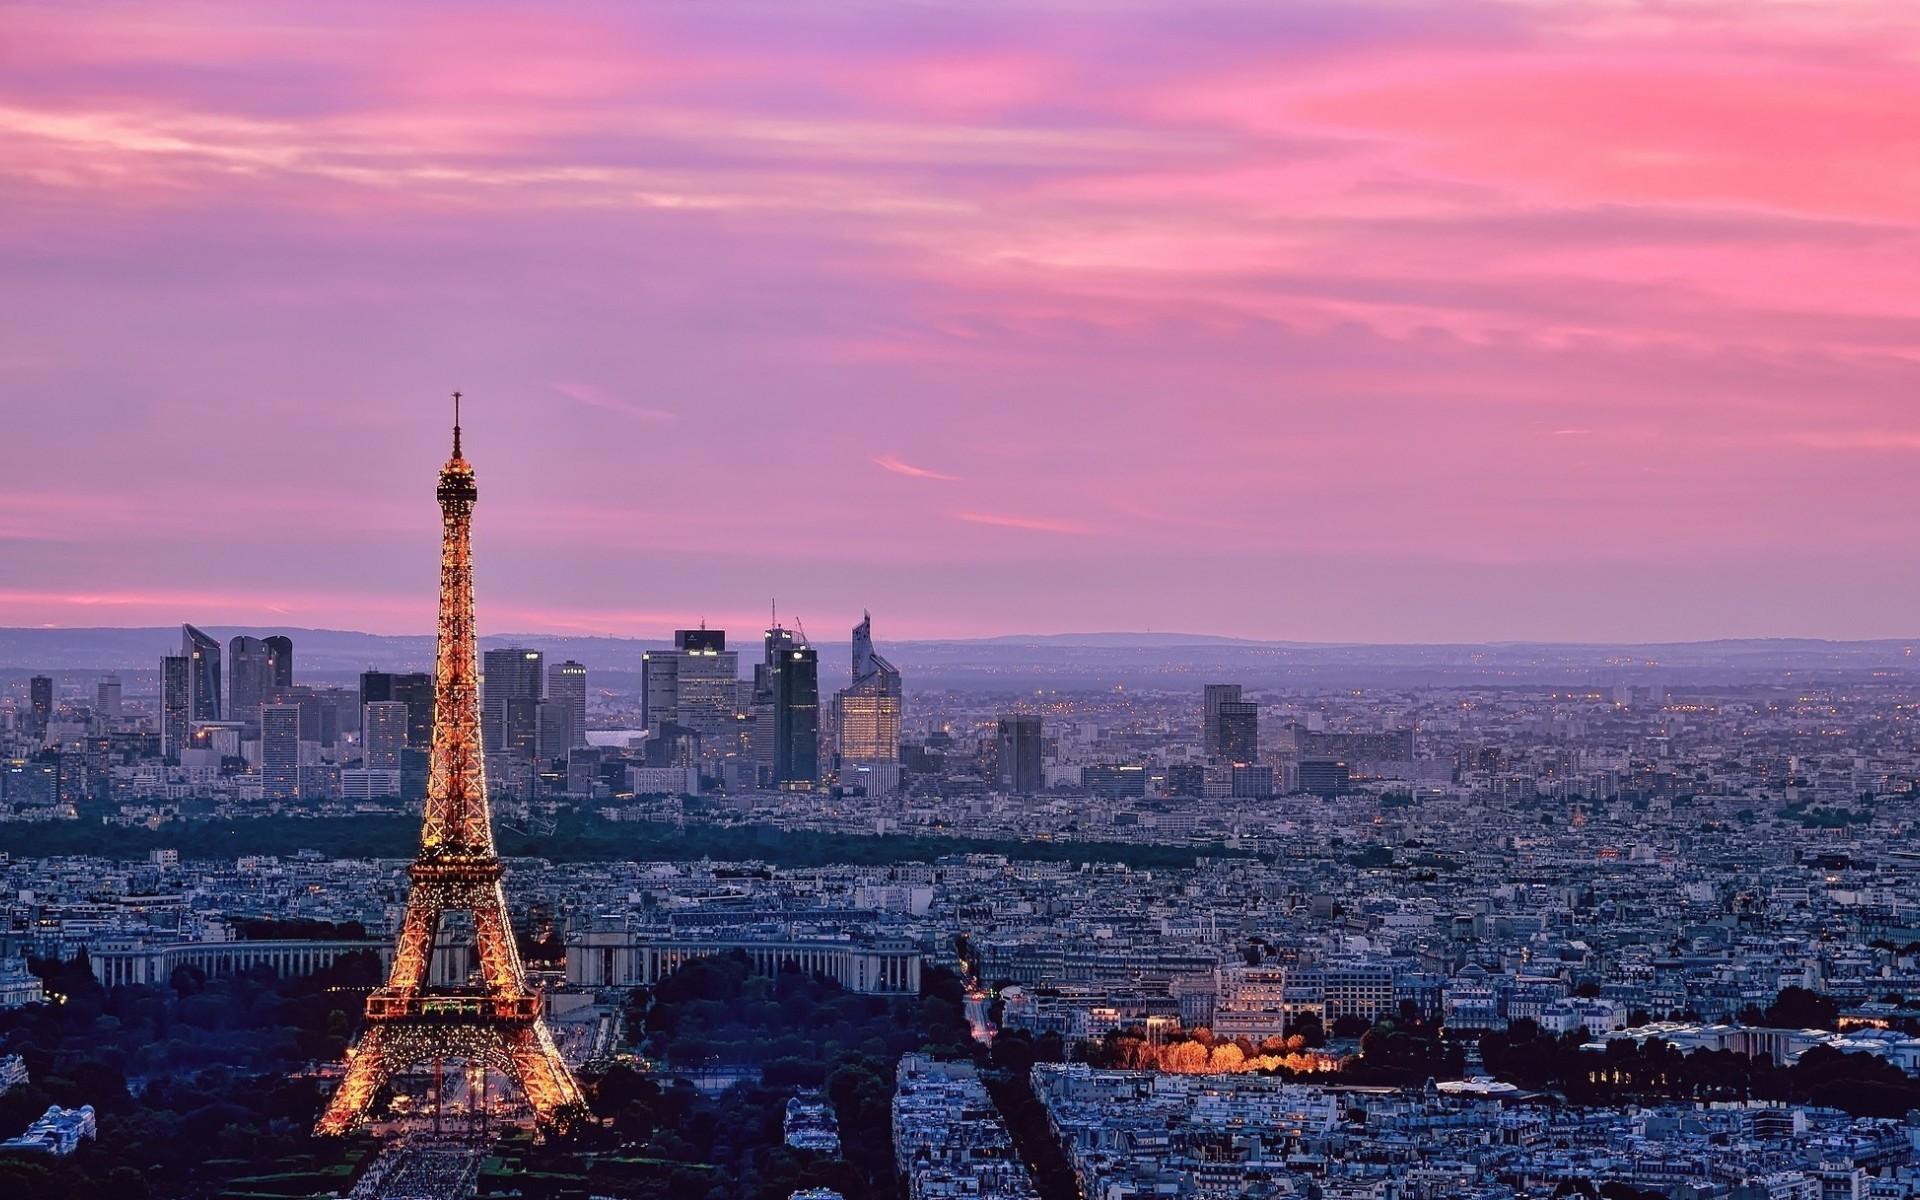 Res: 1920x1200, Pink Paris. Wallpaper: Pink Paris